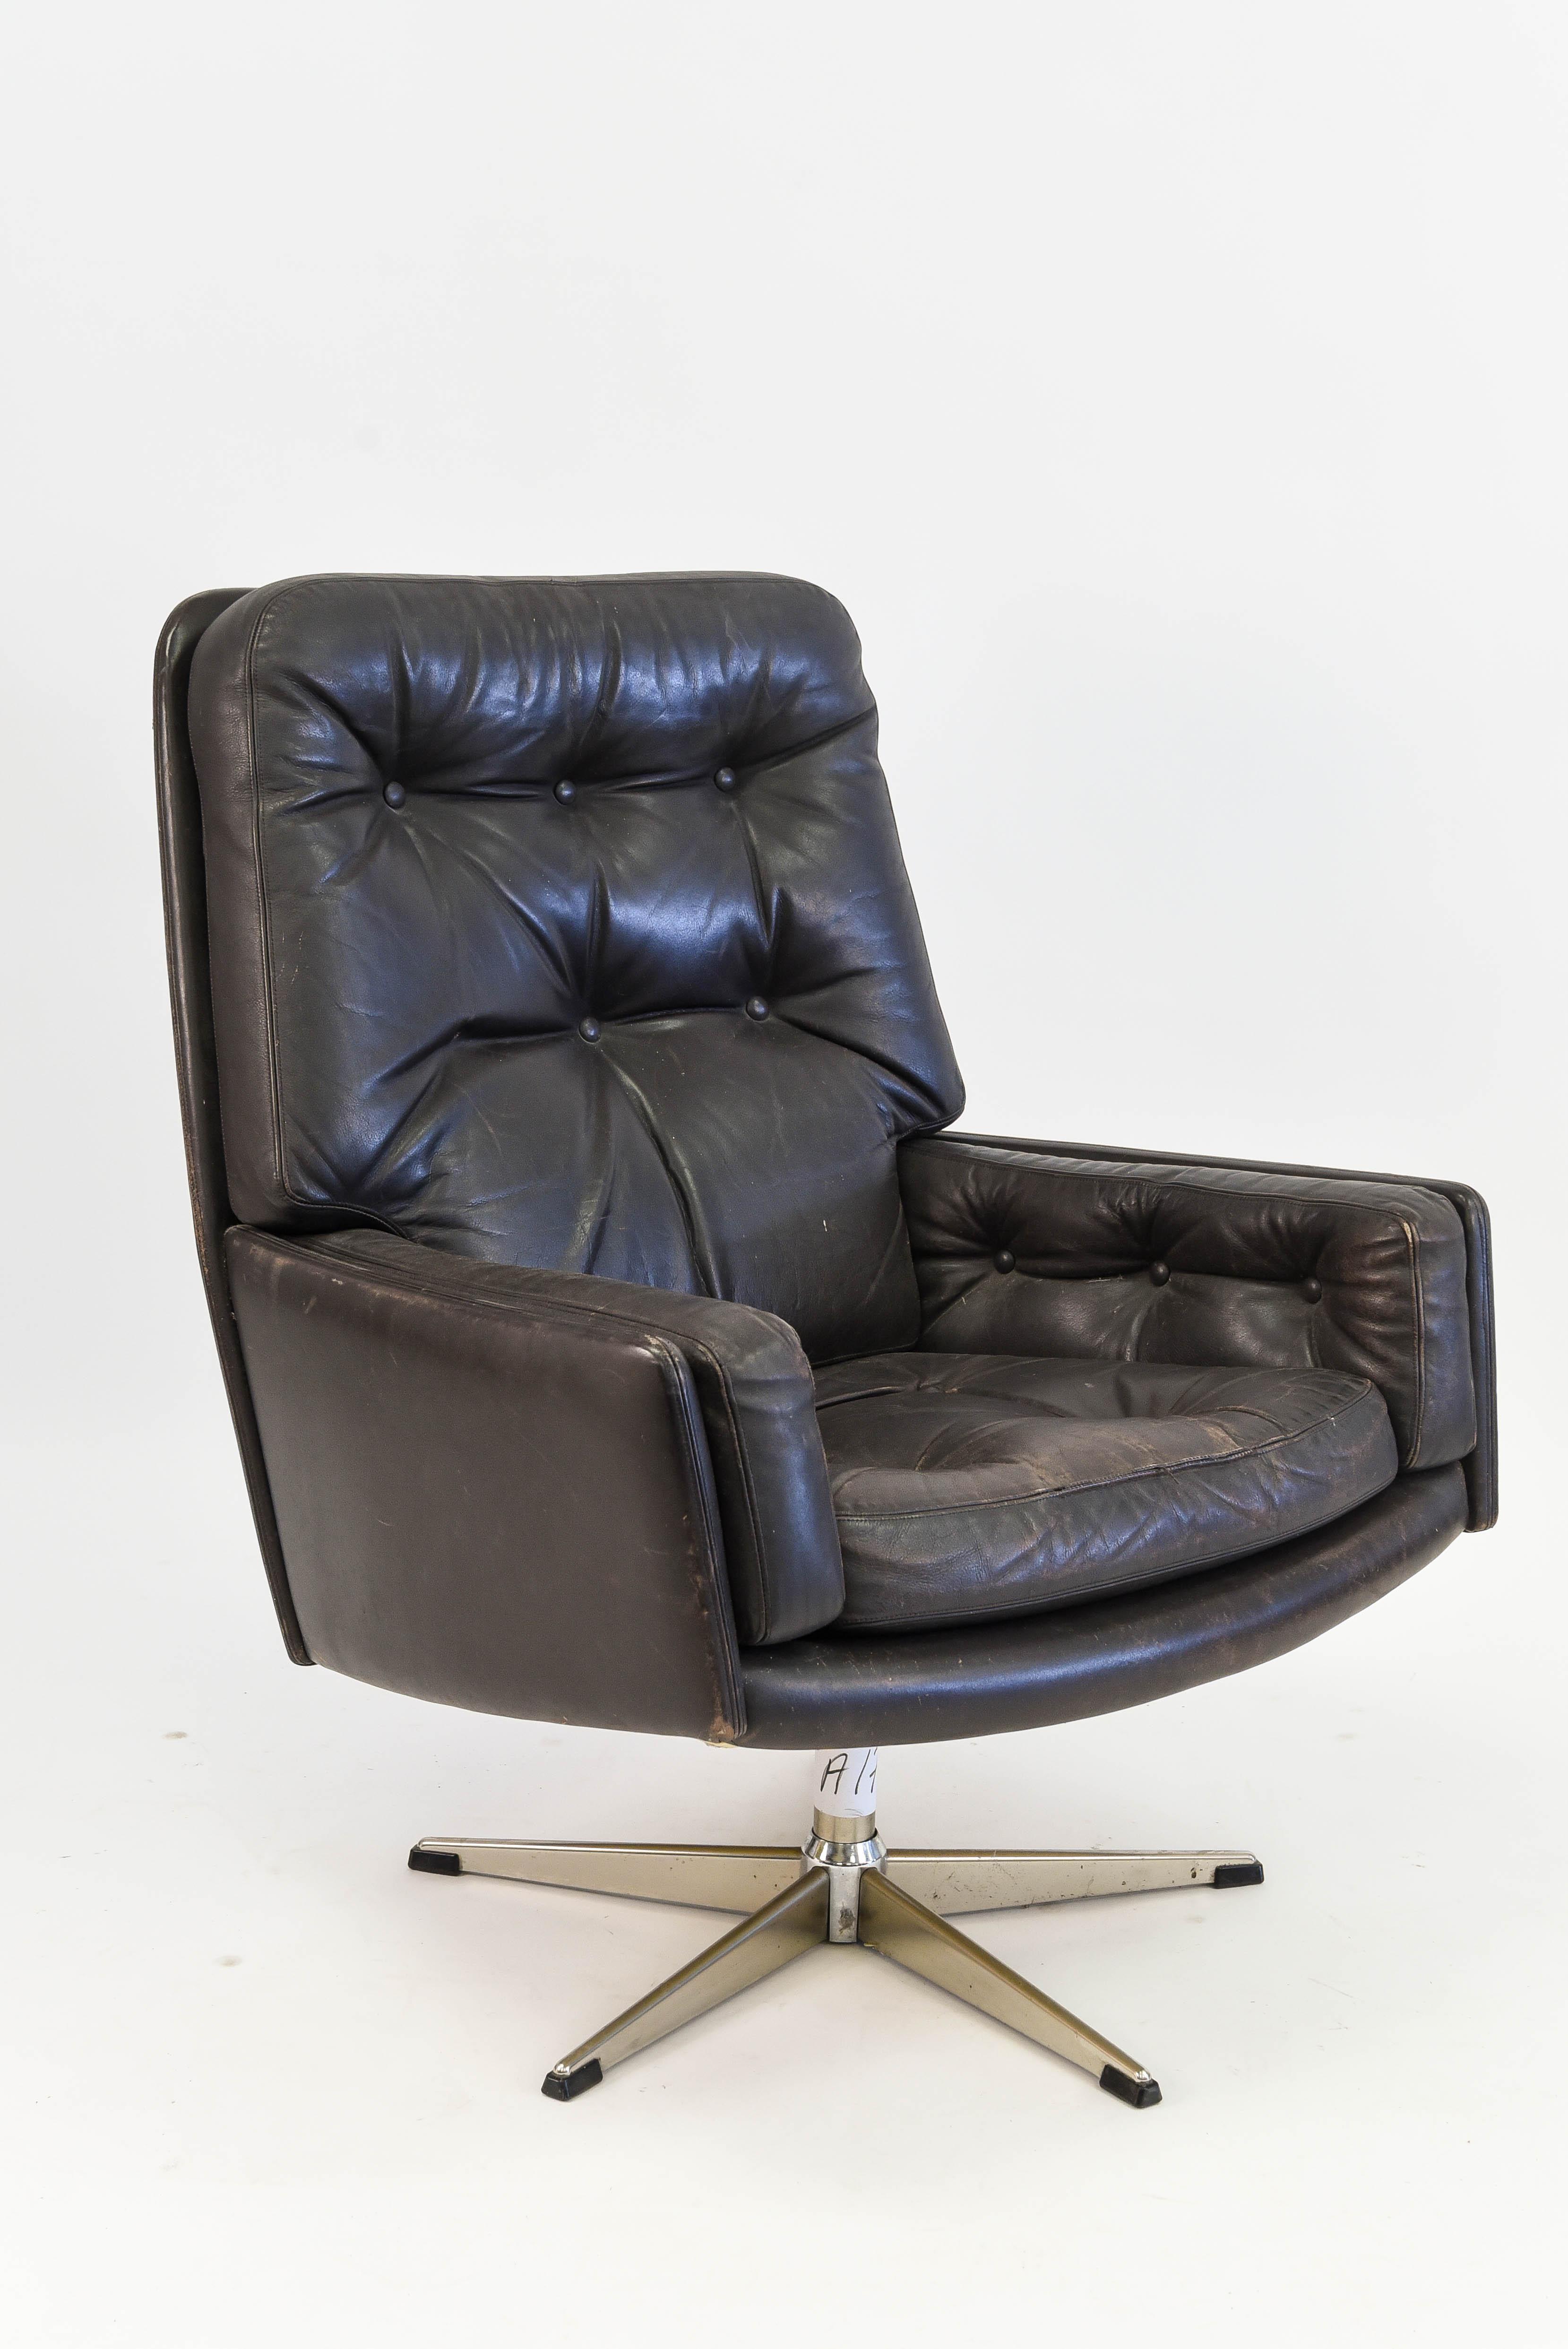 Danish Brown Leather Executive Swivel Chair